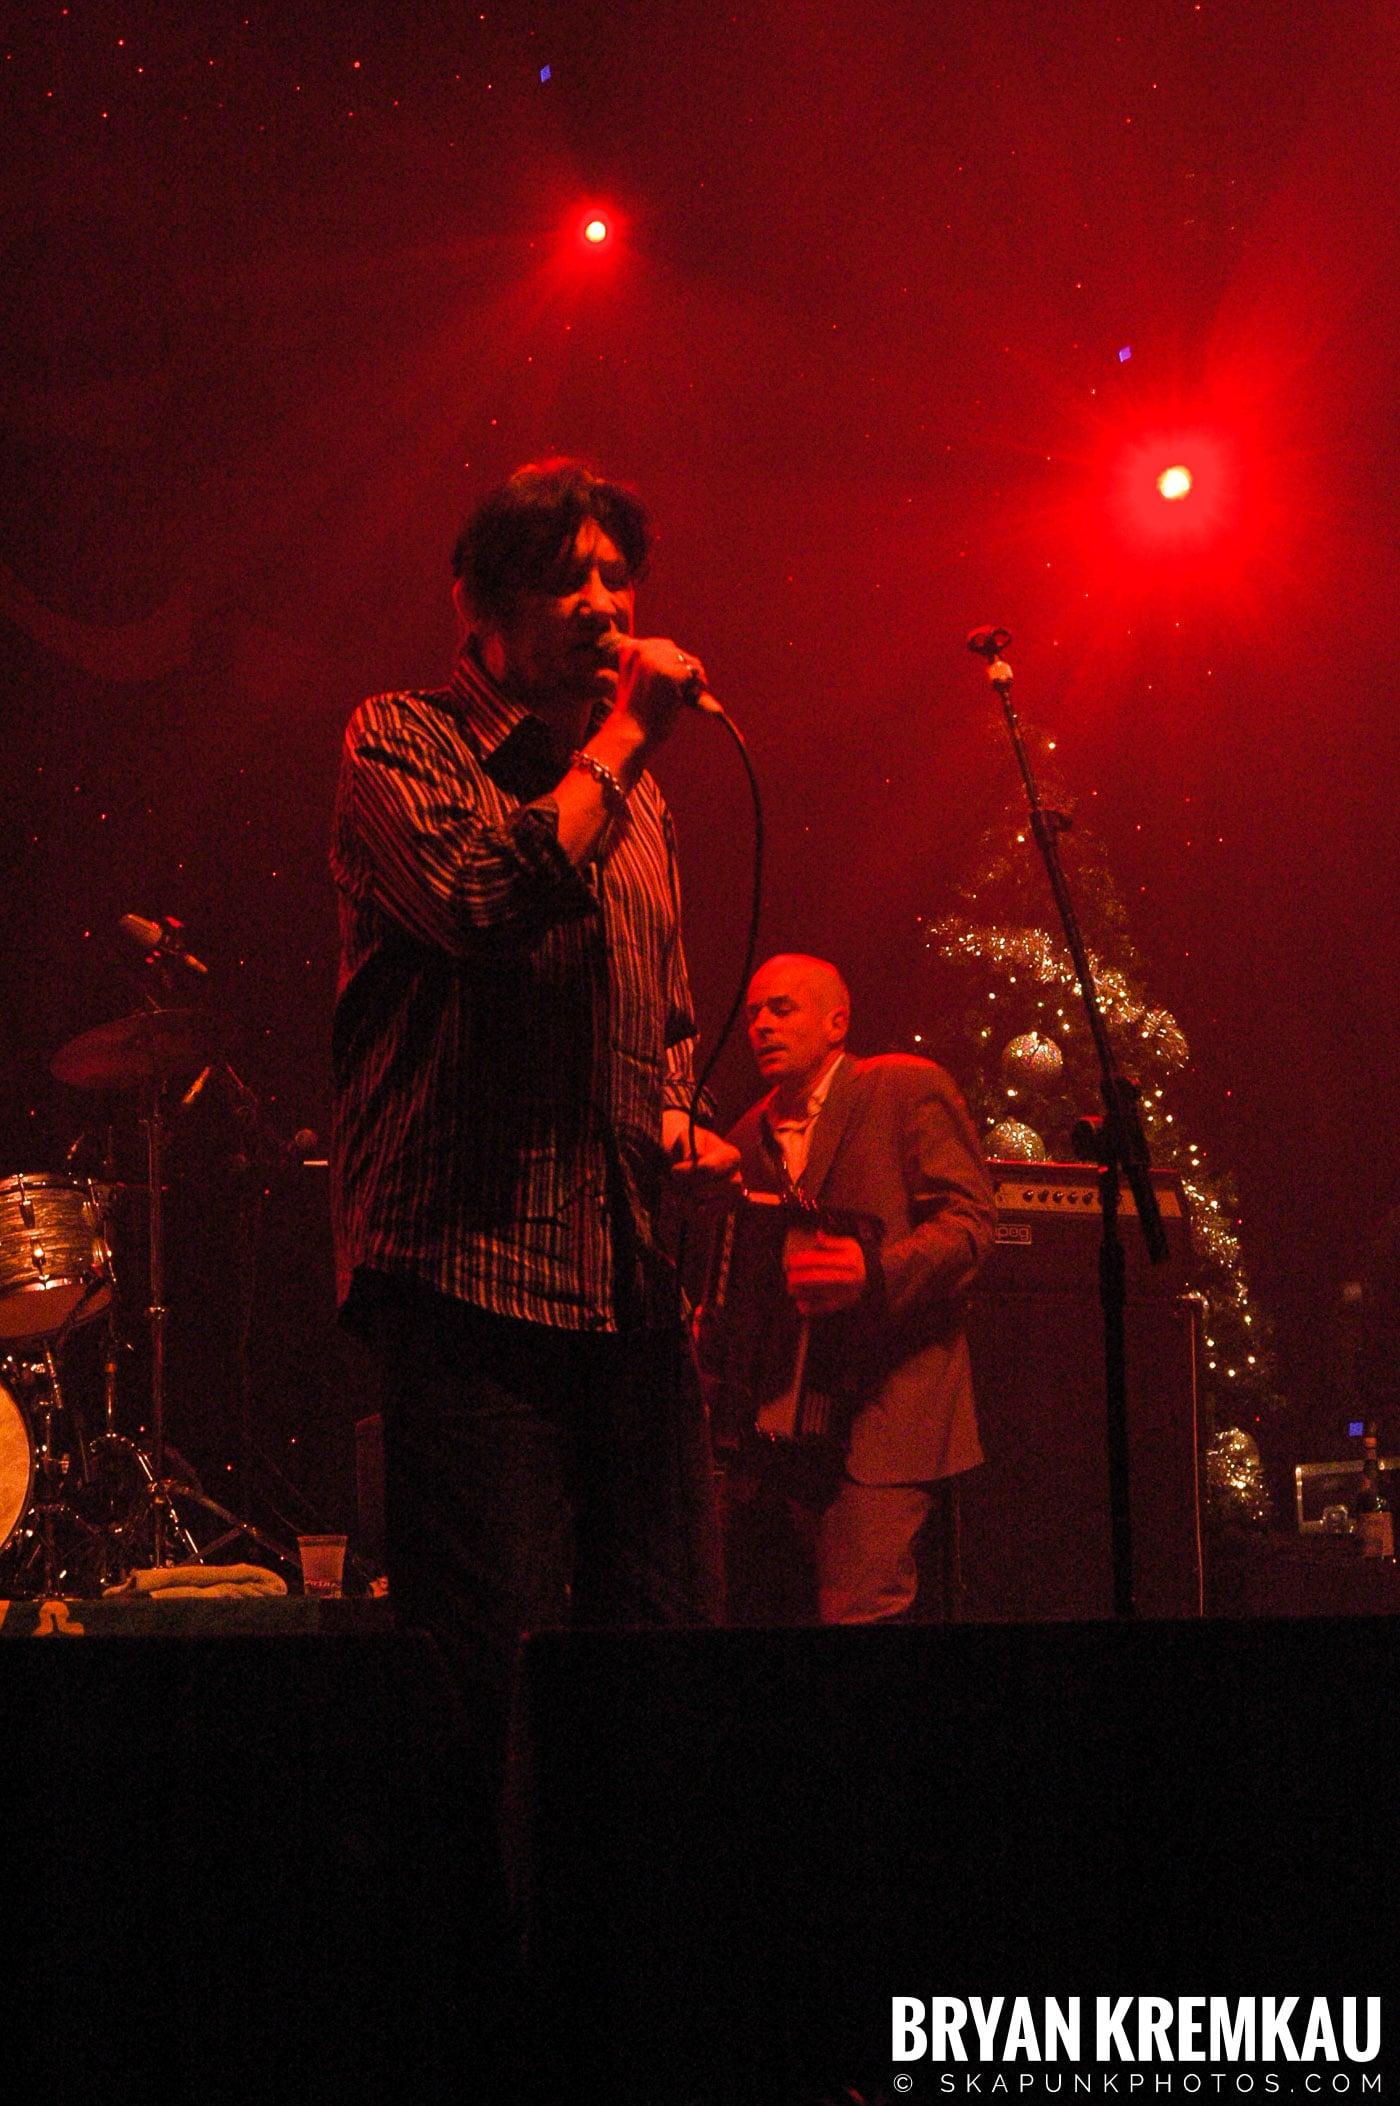 The Pogues @ Brixton Academy, London UK - 12.19.05 (4)